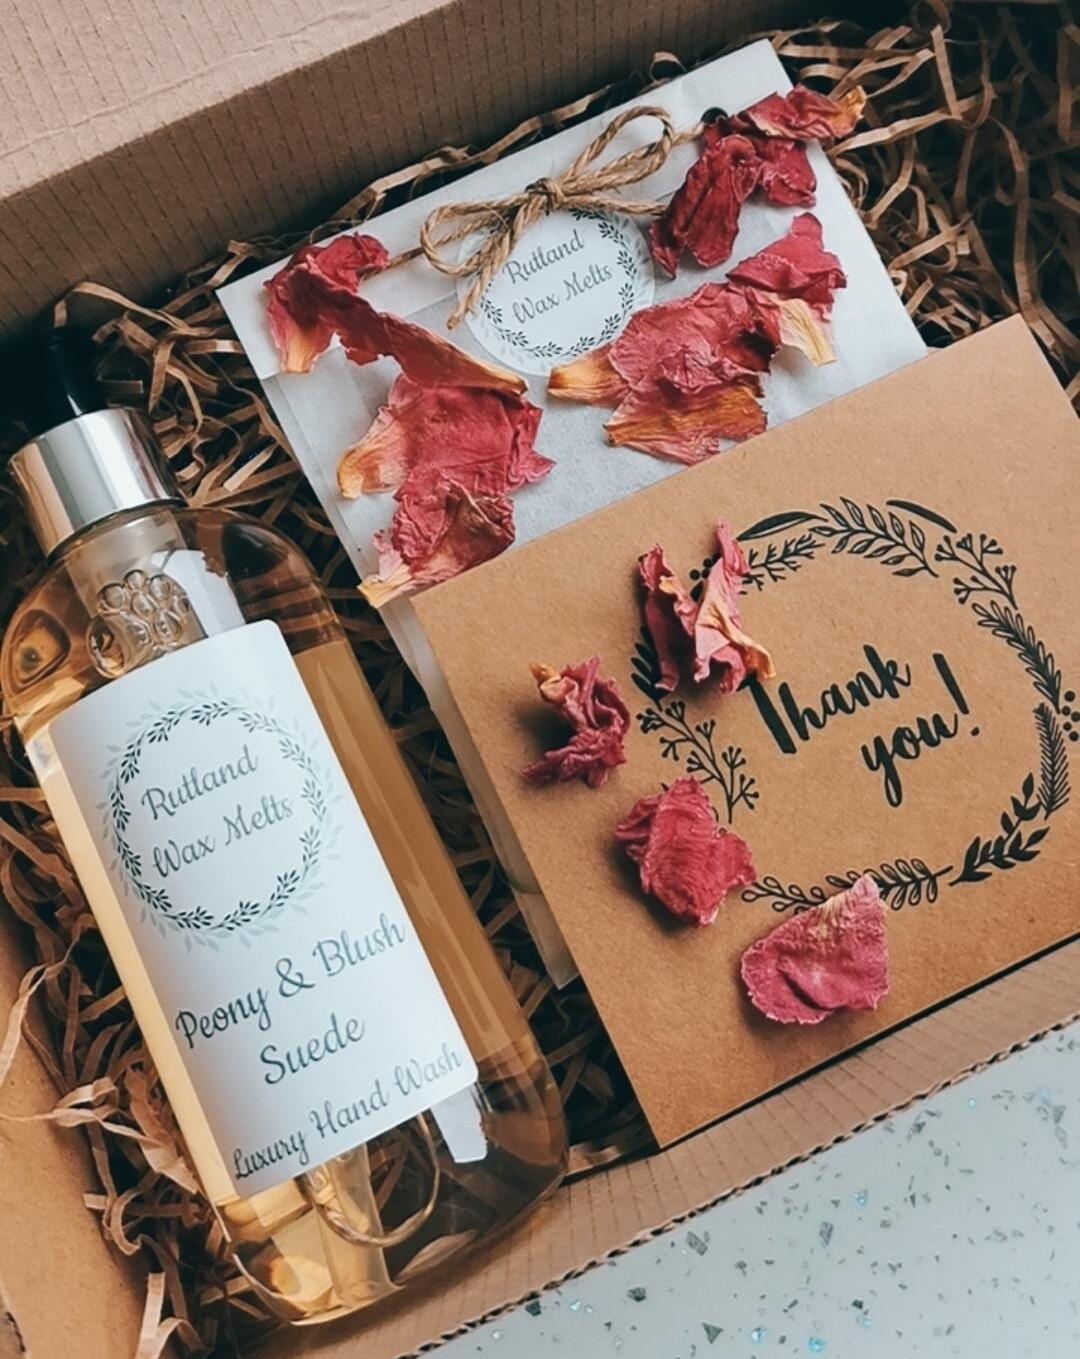 Peony & Blush Suede Gift Set